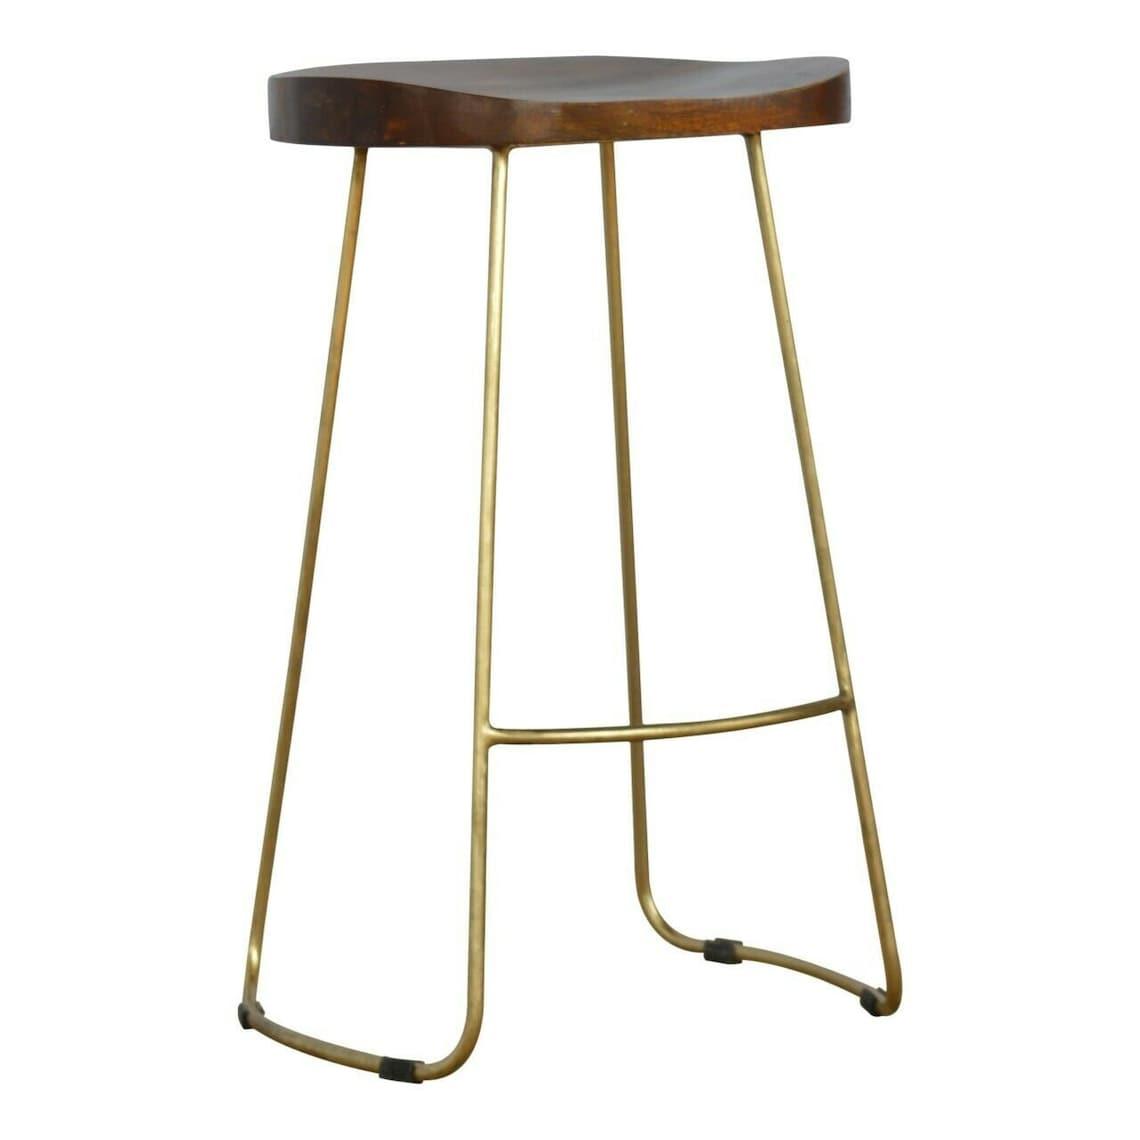 Funky Cafe Bar Stool Breakfast Bar Man Cave Industrial Mango Seat Gold Iron Legs